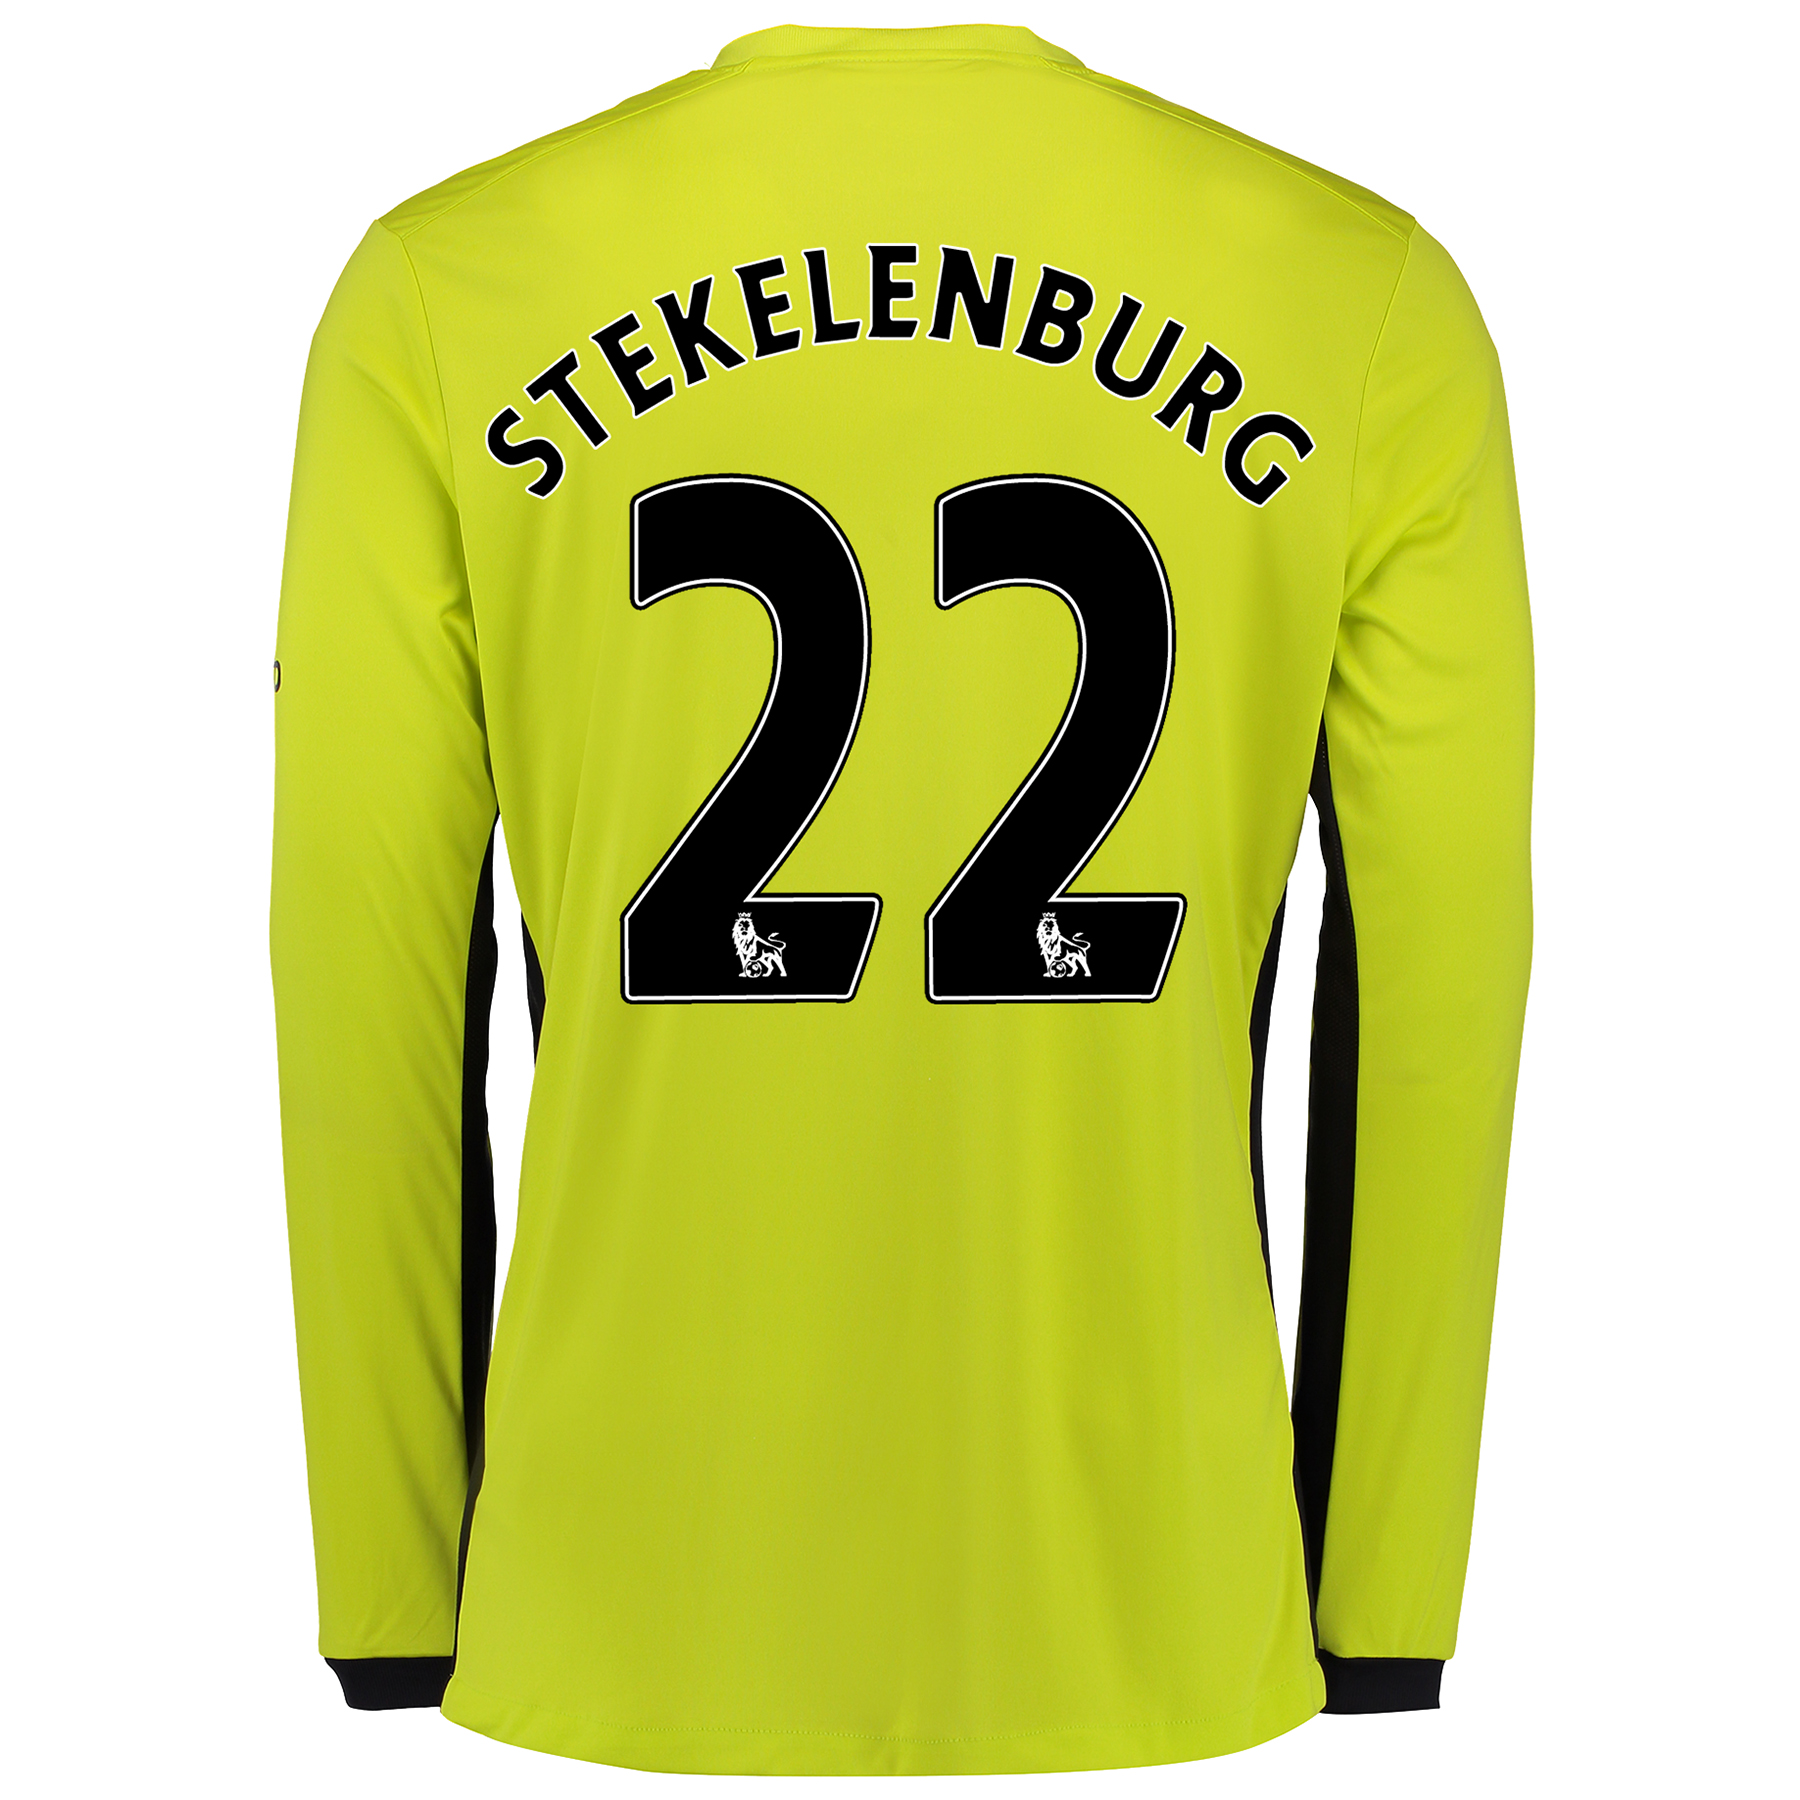 Everton Goalkeeper Home Shirt 2016/17 - Junior with Stekelenburg 22 pr